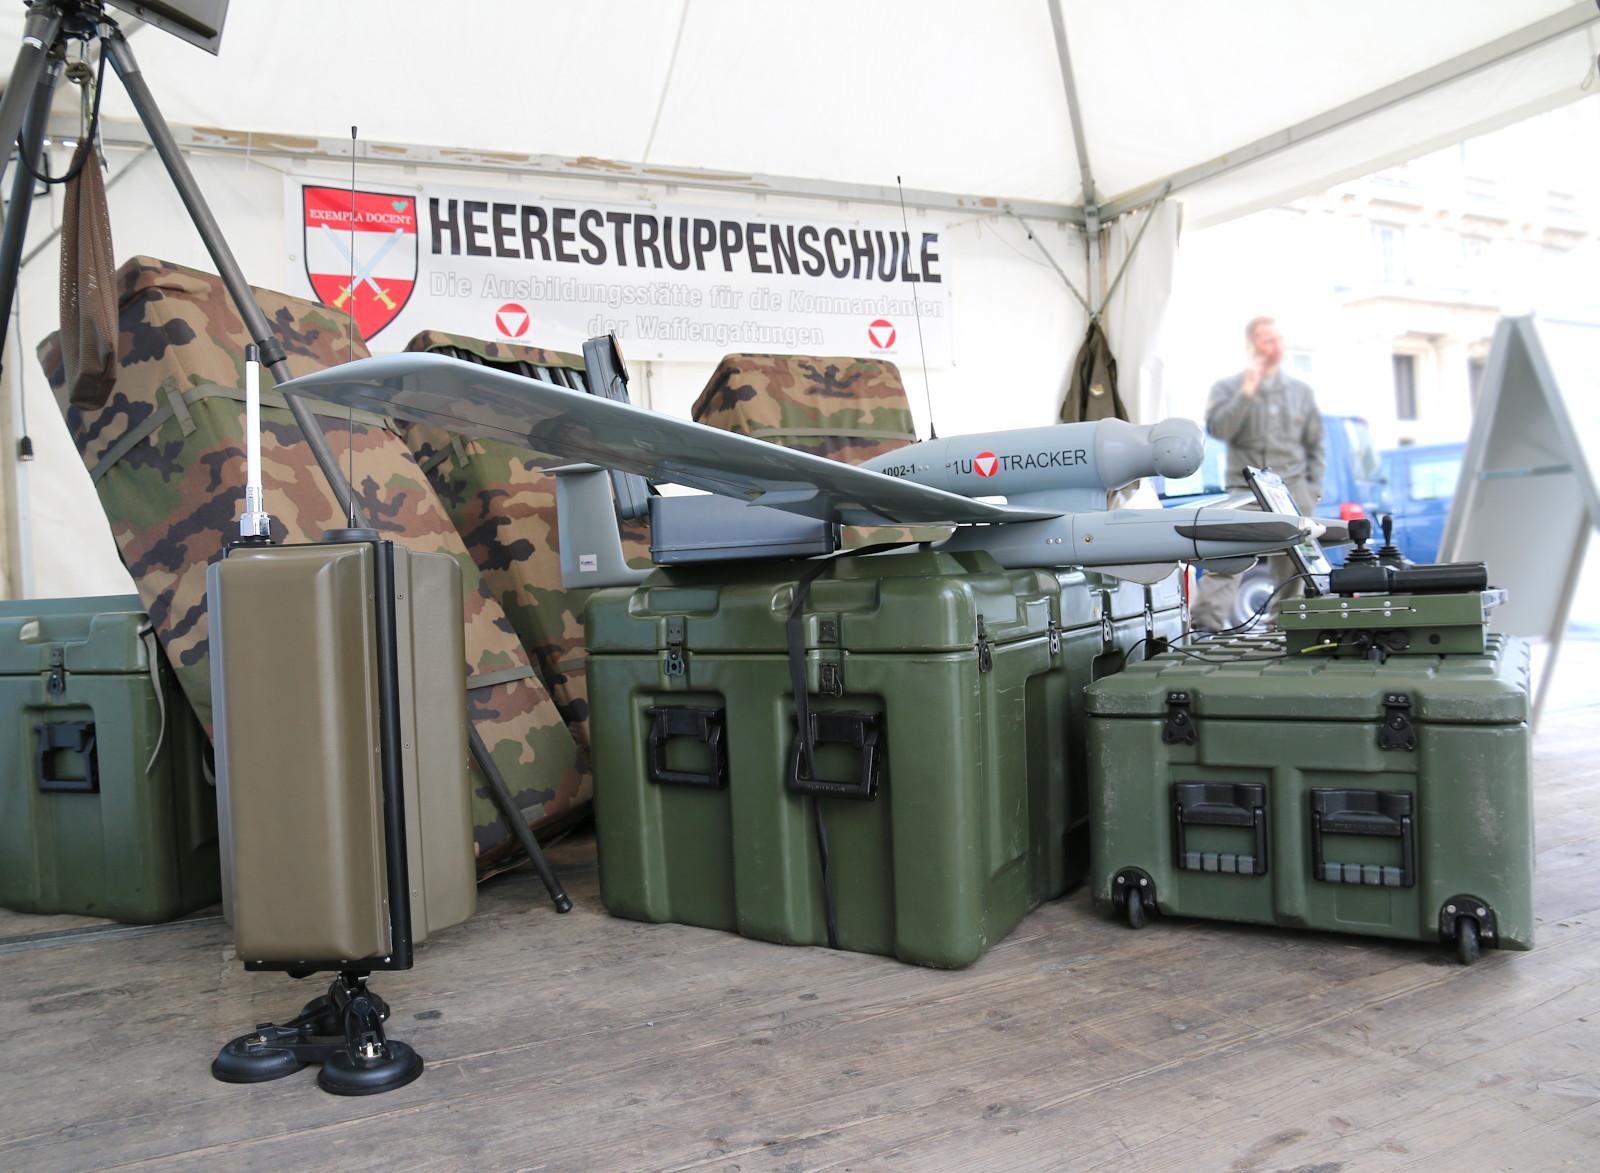 Drohnensystem Tracker / Drac von Survey Copter / Airbus D&S © Doppeladler.com